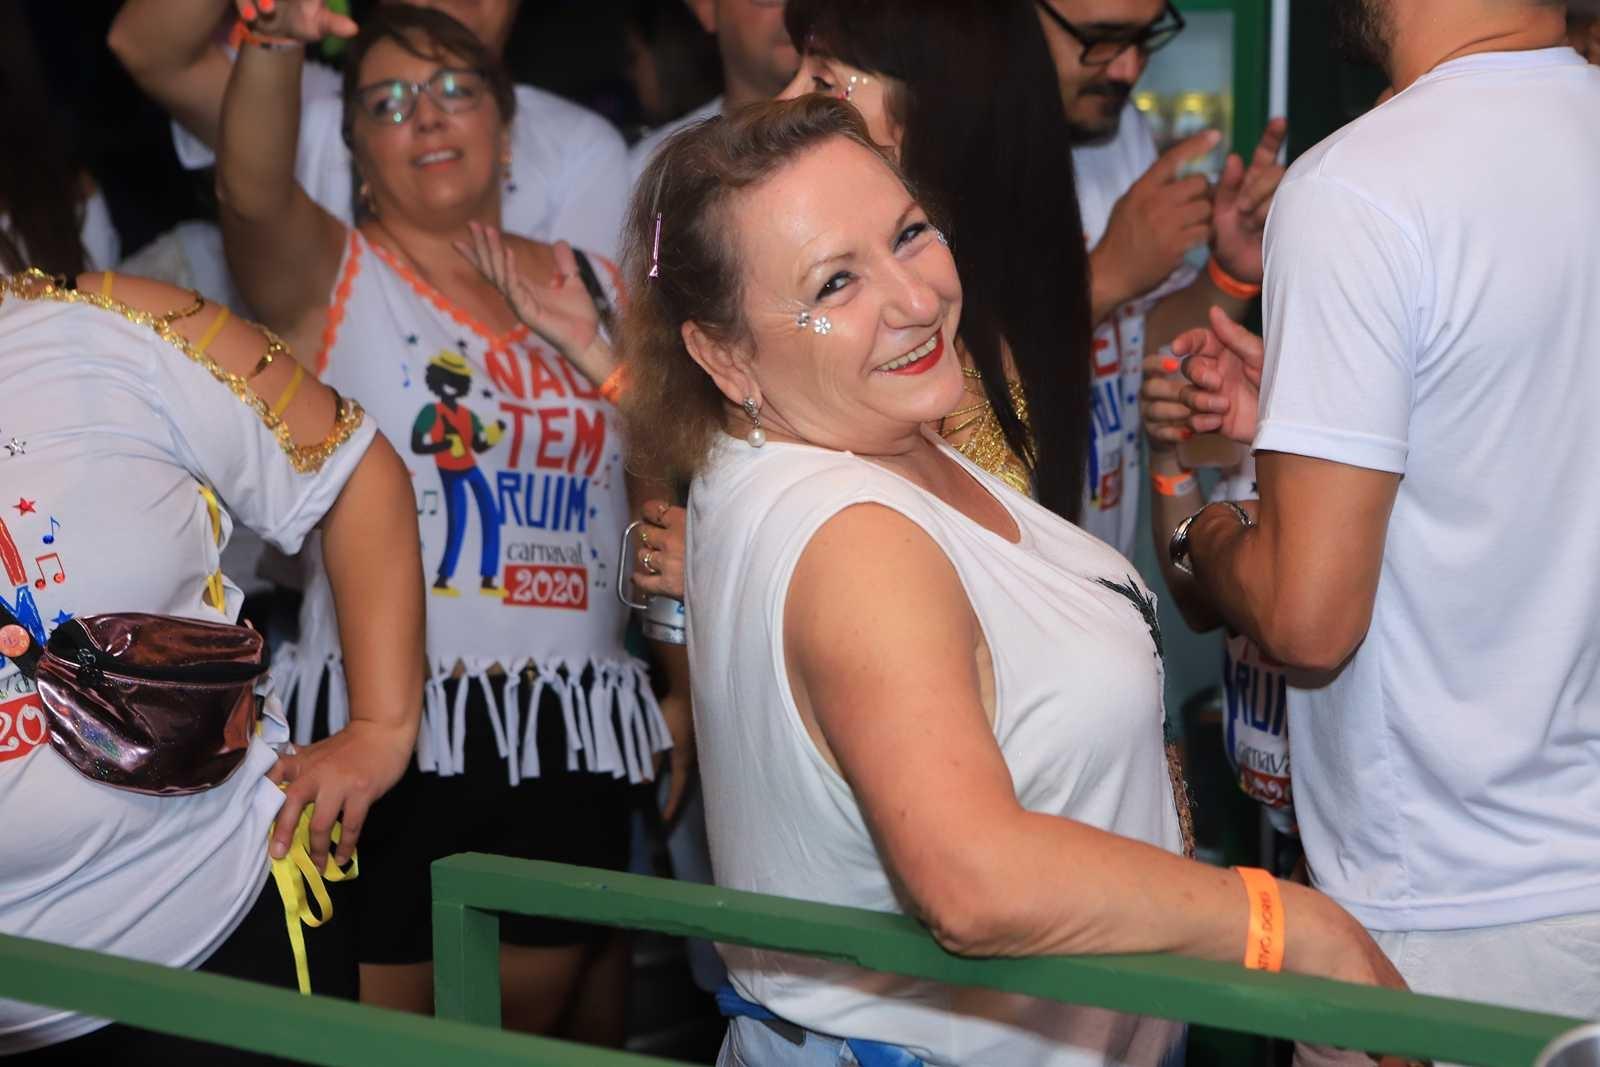 Carnaval Dores 2020: Baile Adulto